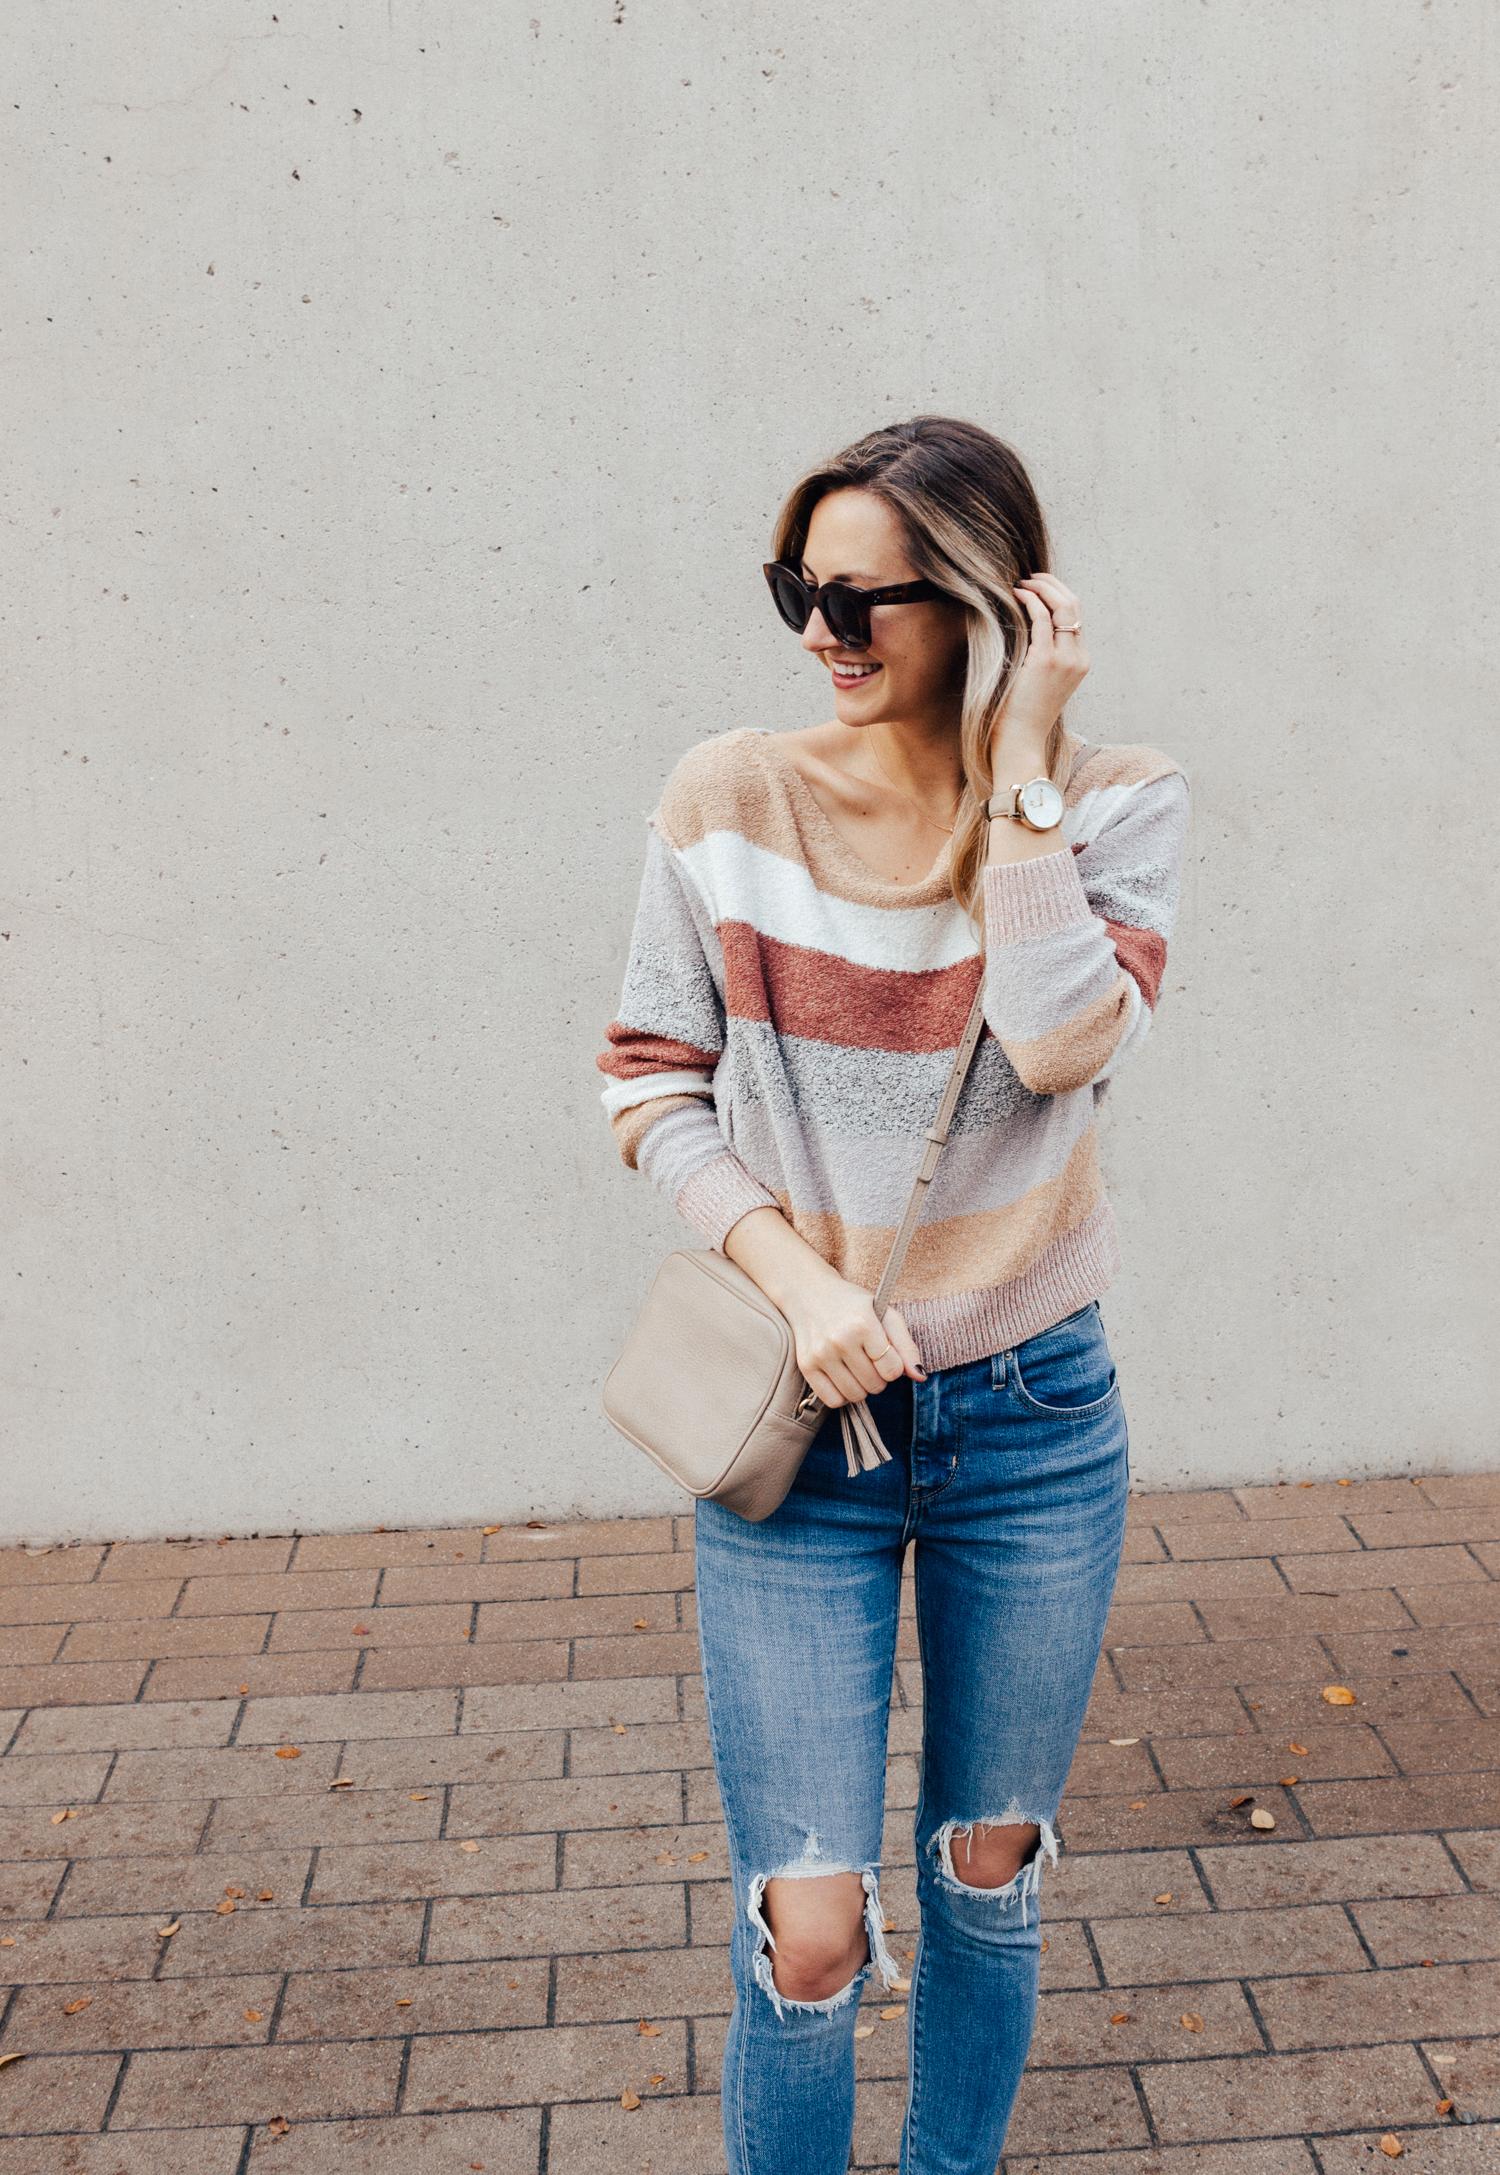 livvyland-blog-olivia-watson-free-people-blush-beige-tan-sweater-tassel-slides-cozy-layers-5